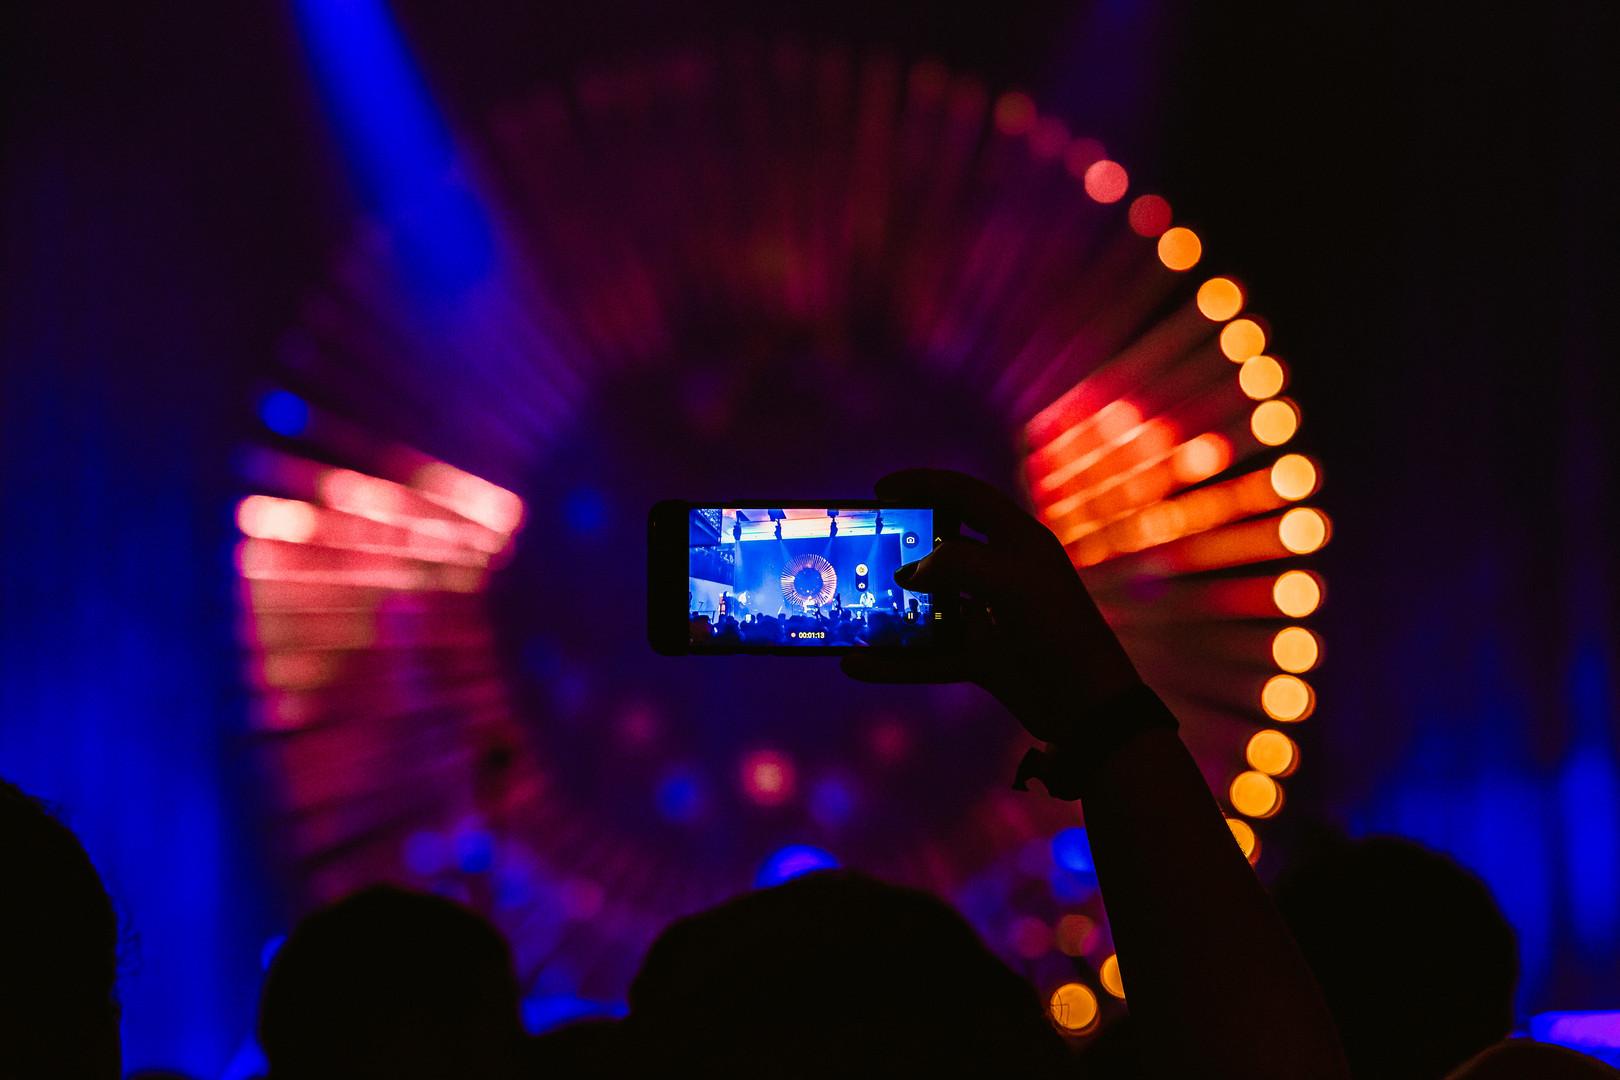 microsoft give gala event